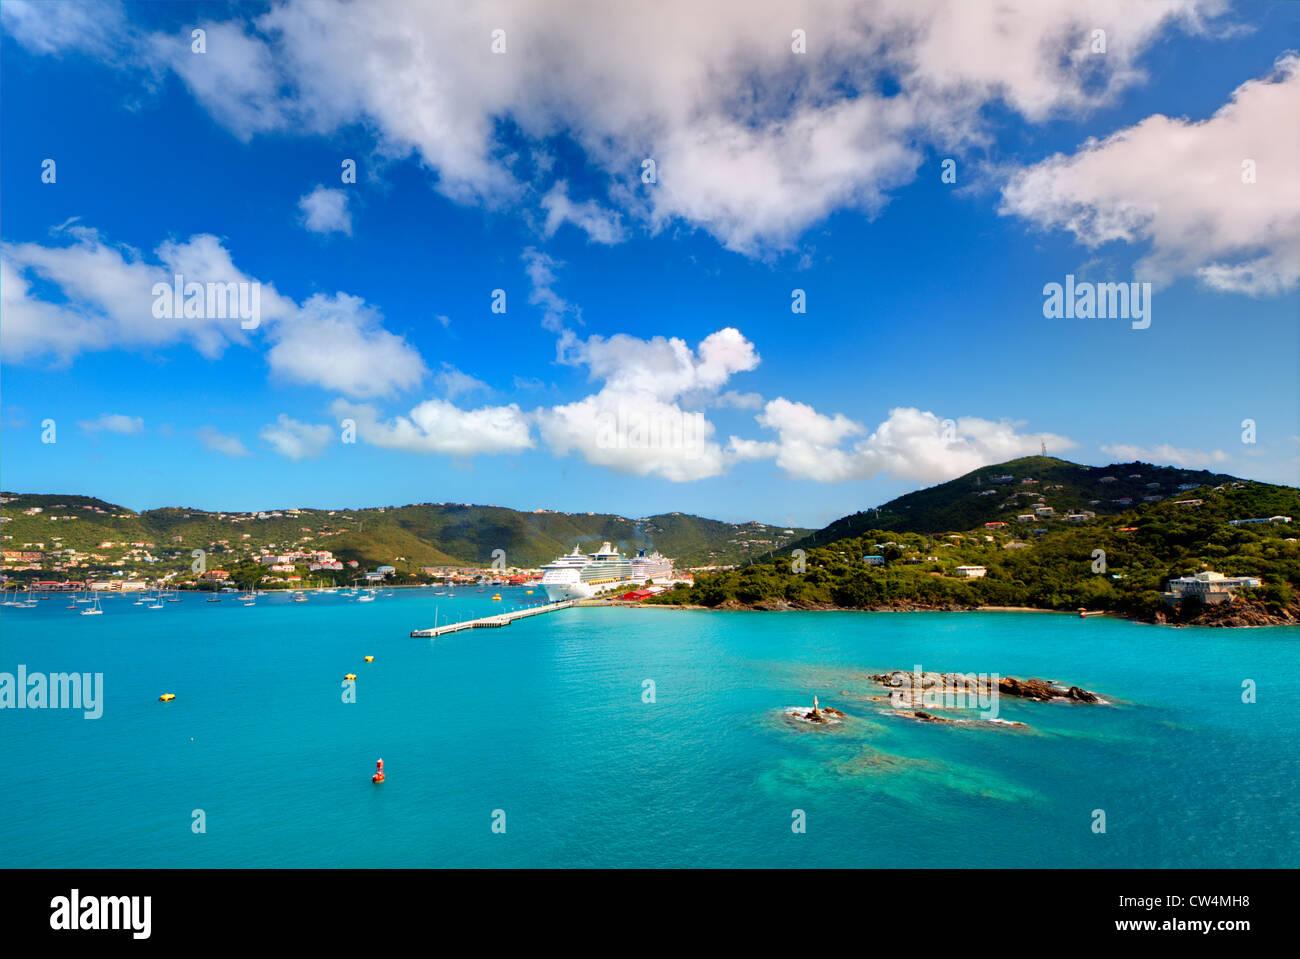 Coast of Charlotte Amalie in St. Thomas, U.S. Virgin Islands. - Stock Image